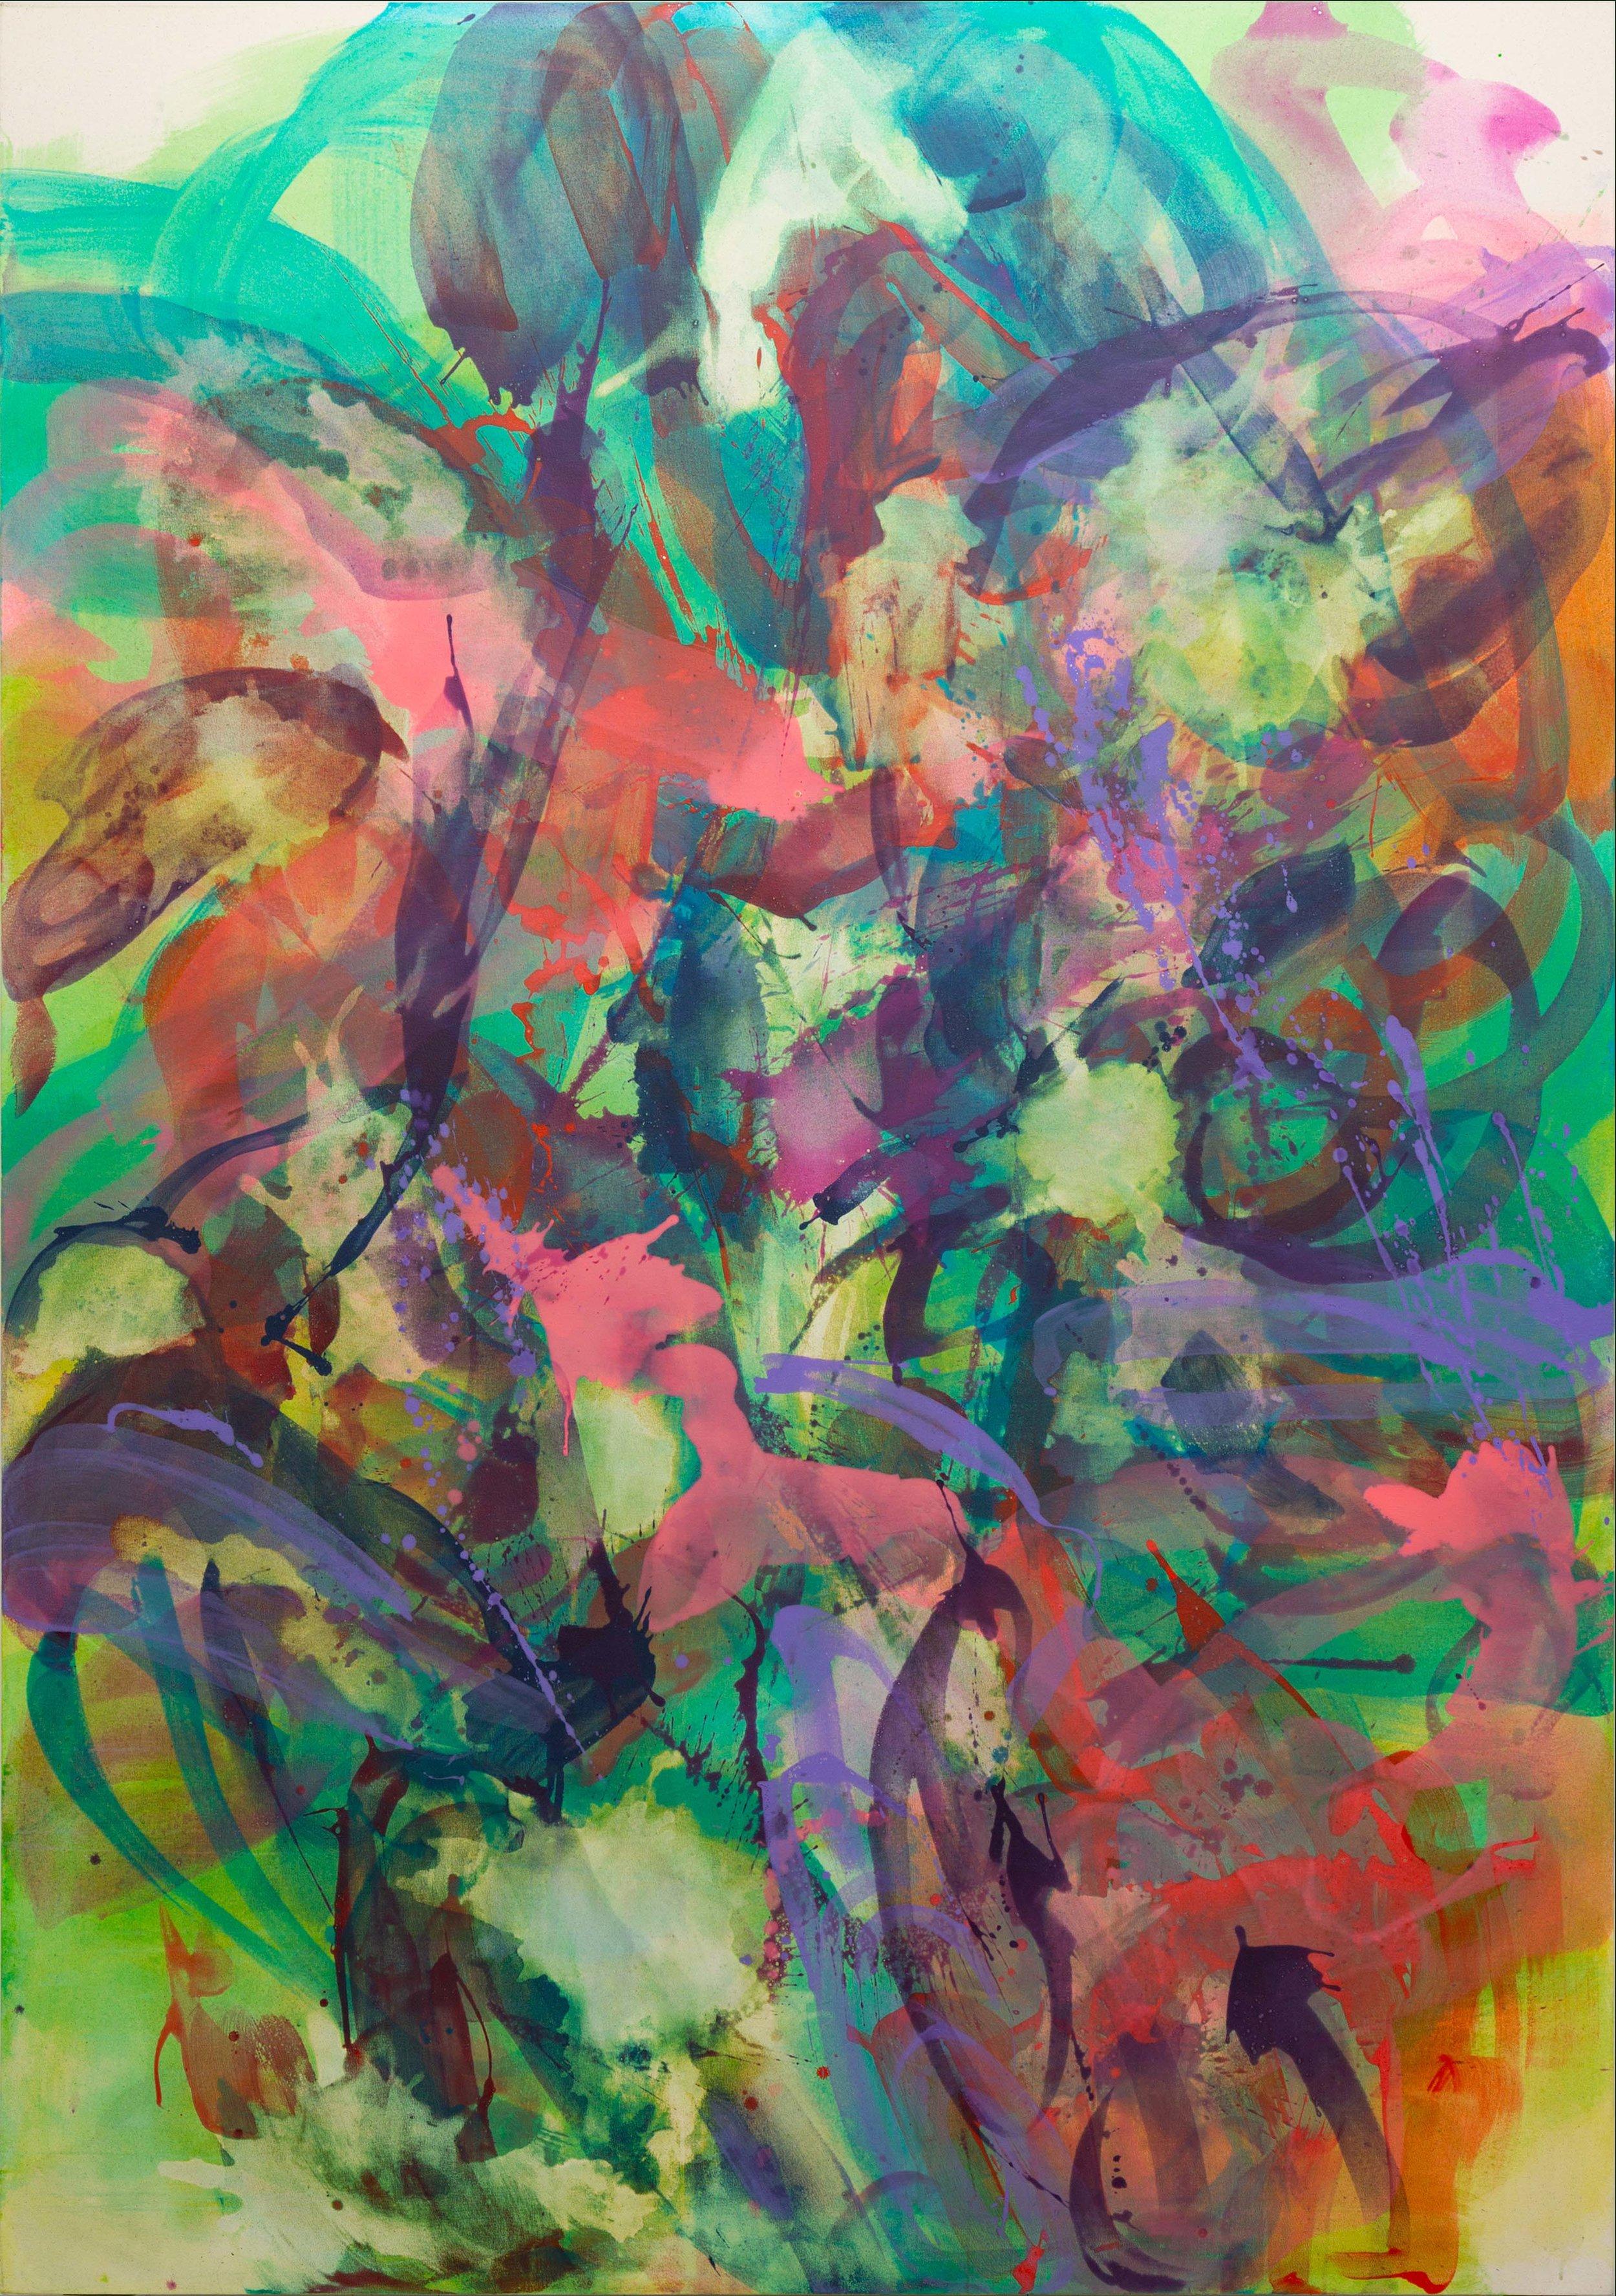 Distemper xl II  2019  distemper on canvas  (pure pigment, rabbit skin glue)  235.5 x 165 cm